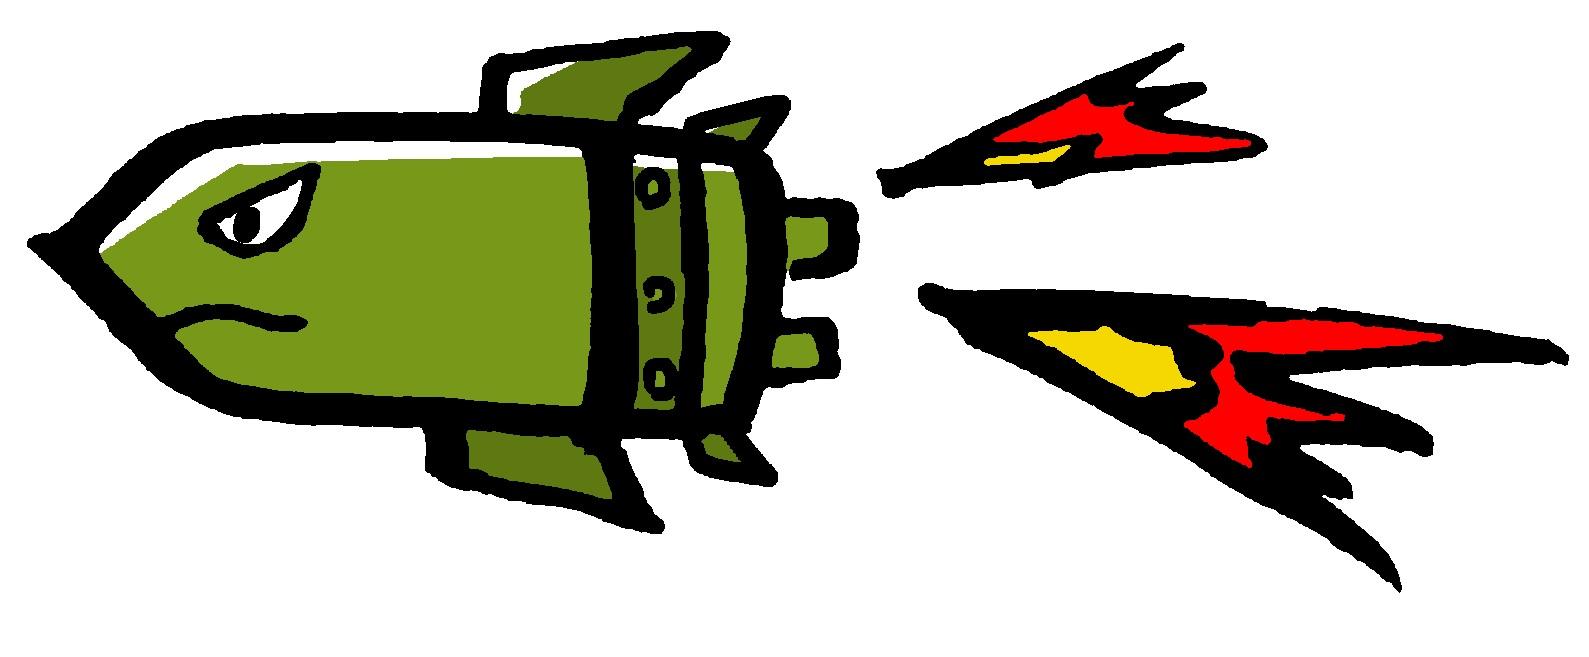 missile - 北朝鮮が5月14日に新型高度2000Kmミサイル発射~その意図は